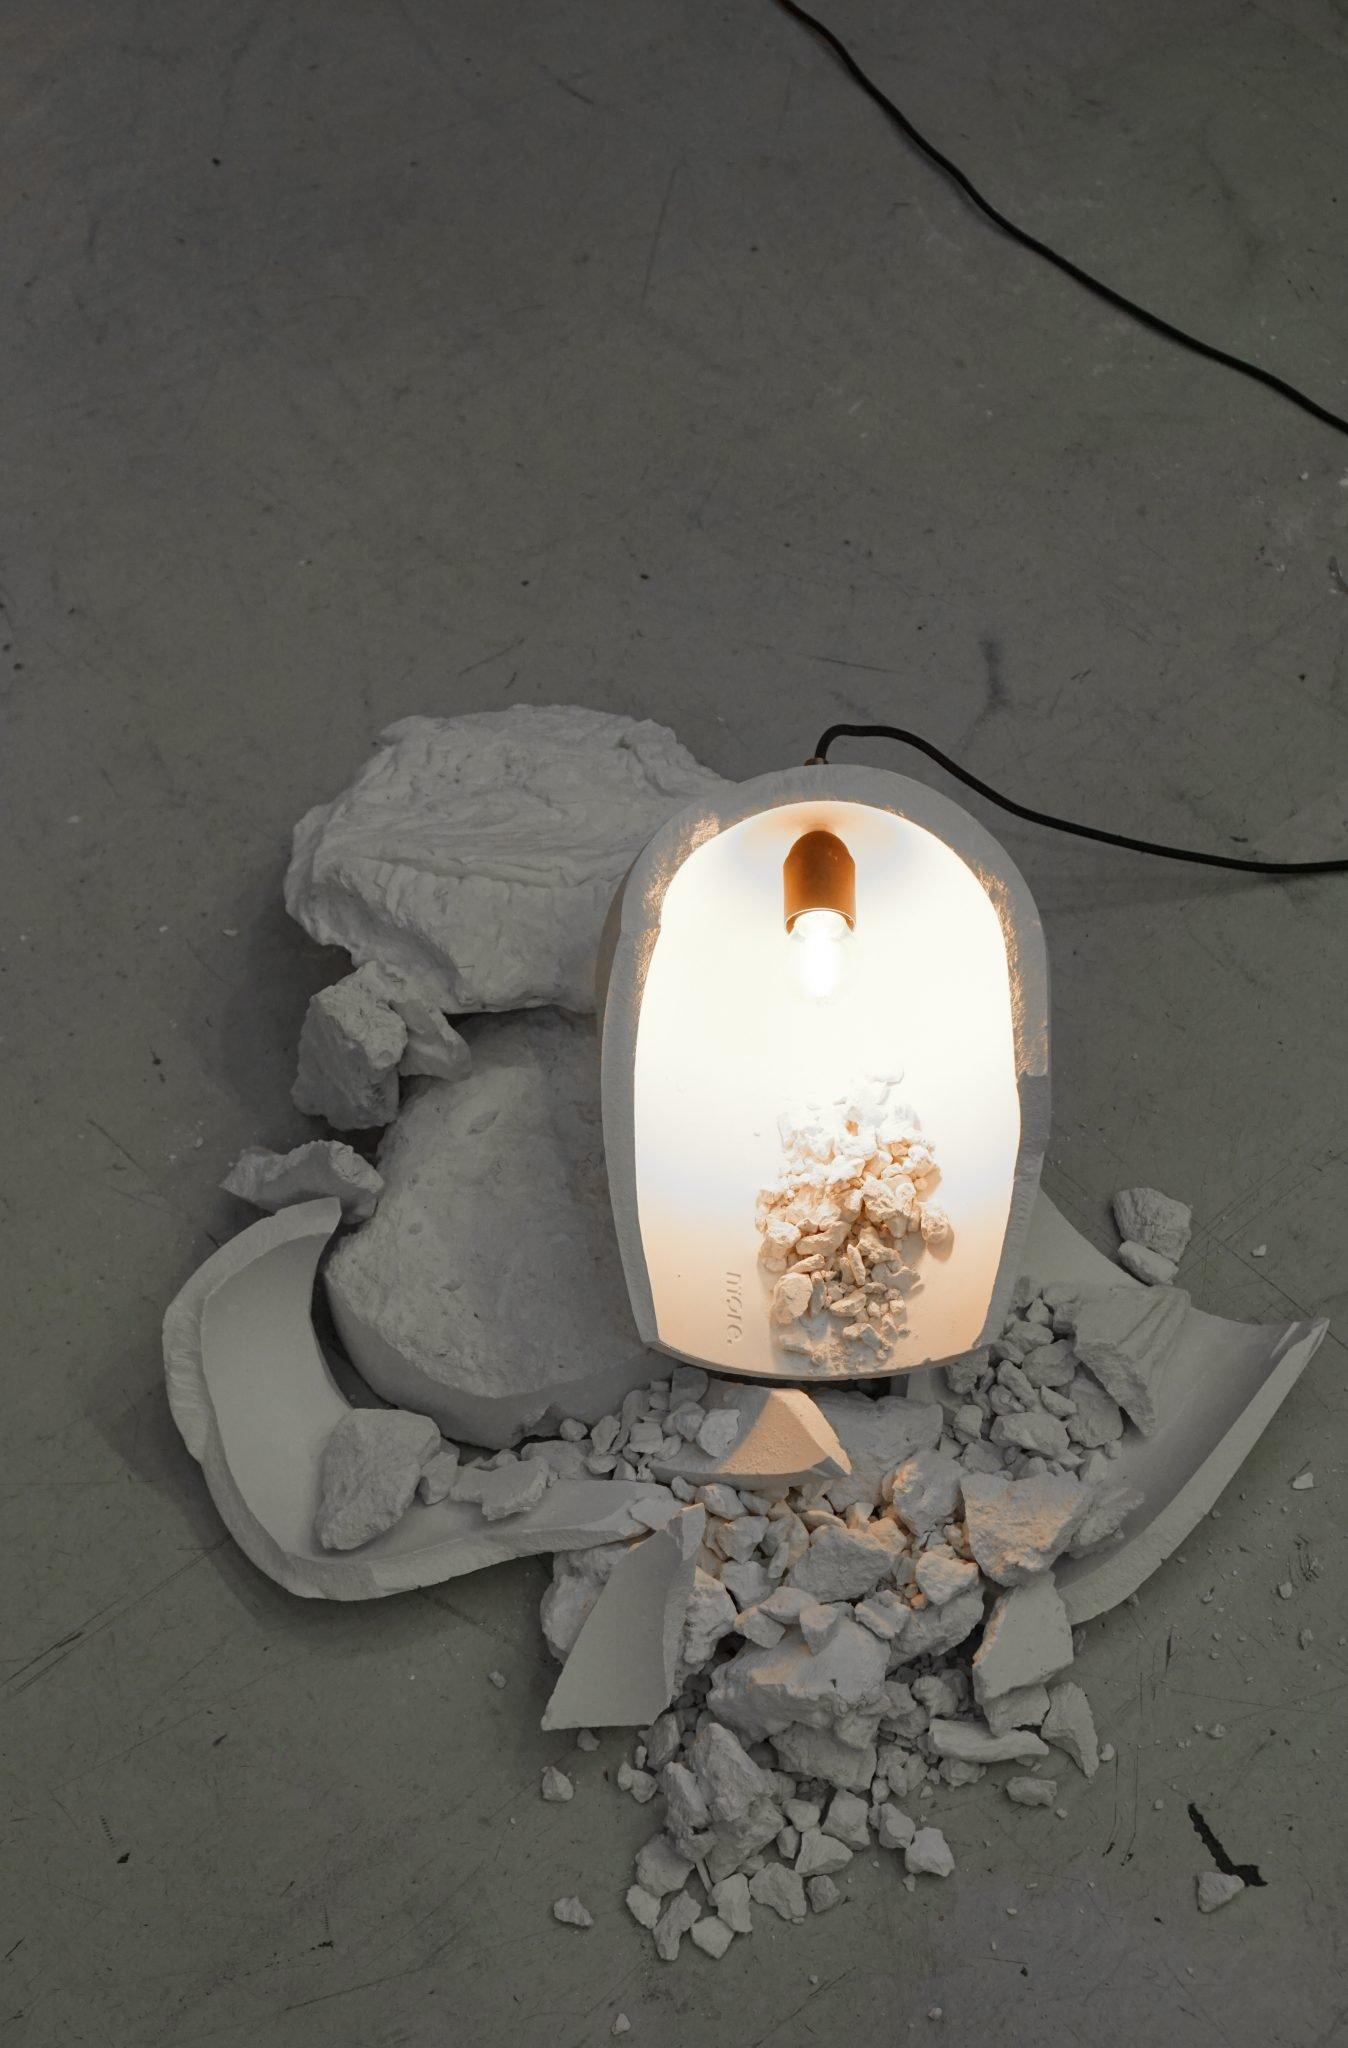 duurzame lamp van recycled materiaal